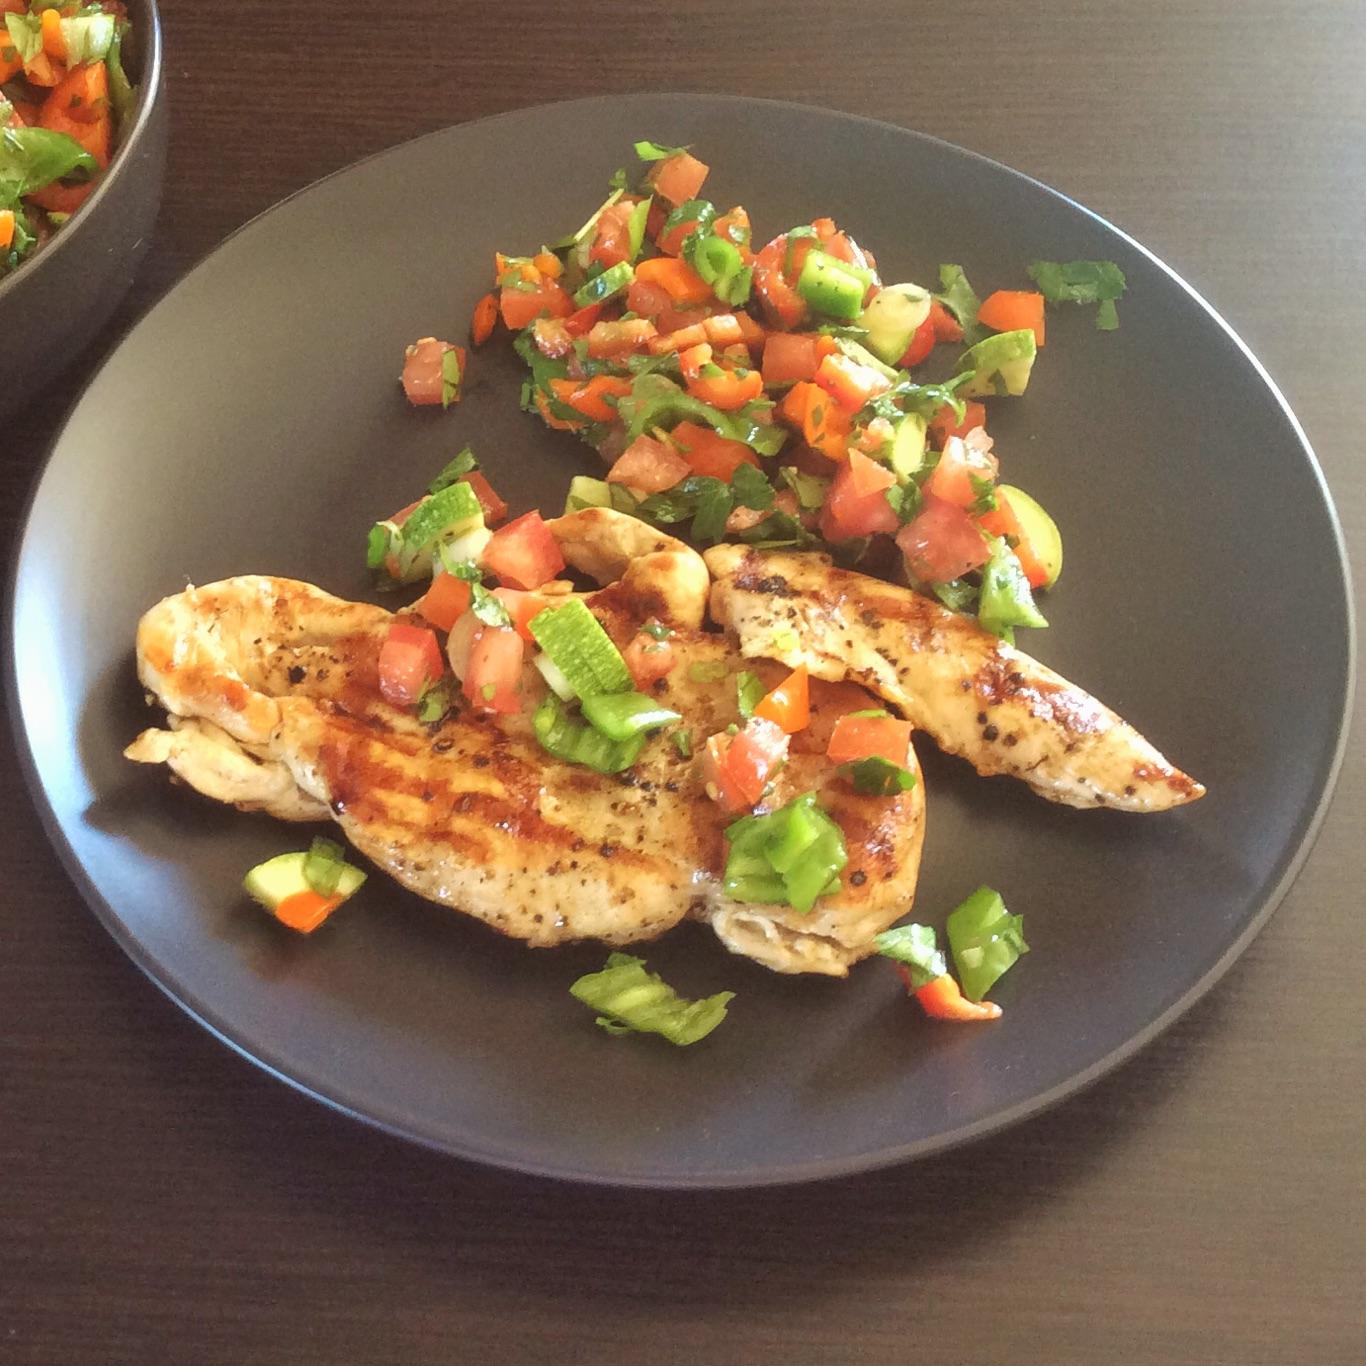 Chicken Paillard Herbed Salad Frixos Personal Chefing